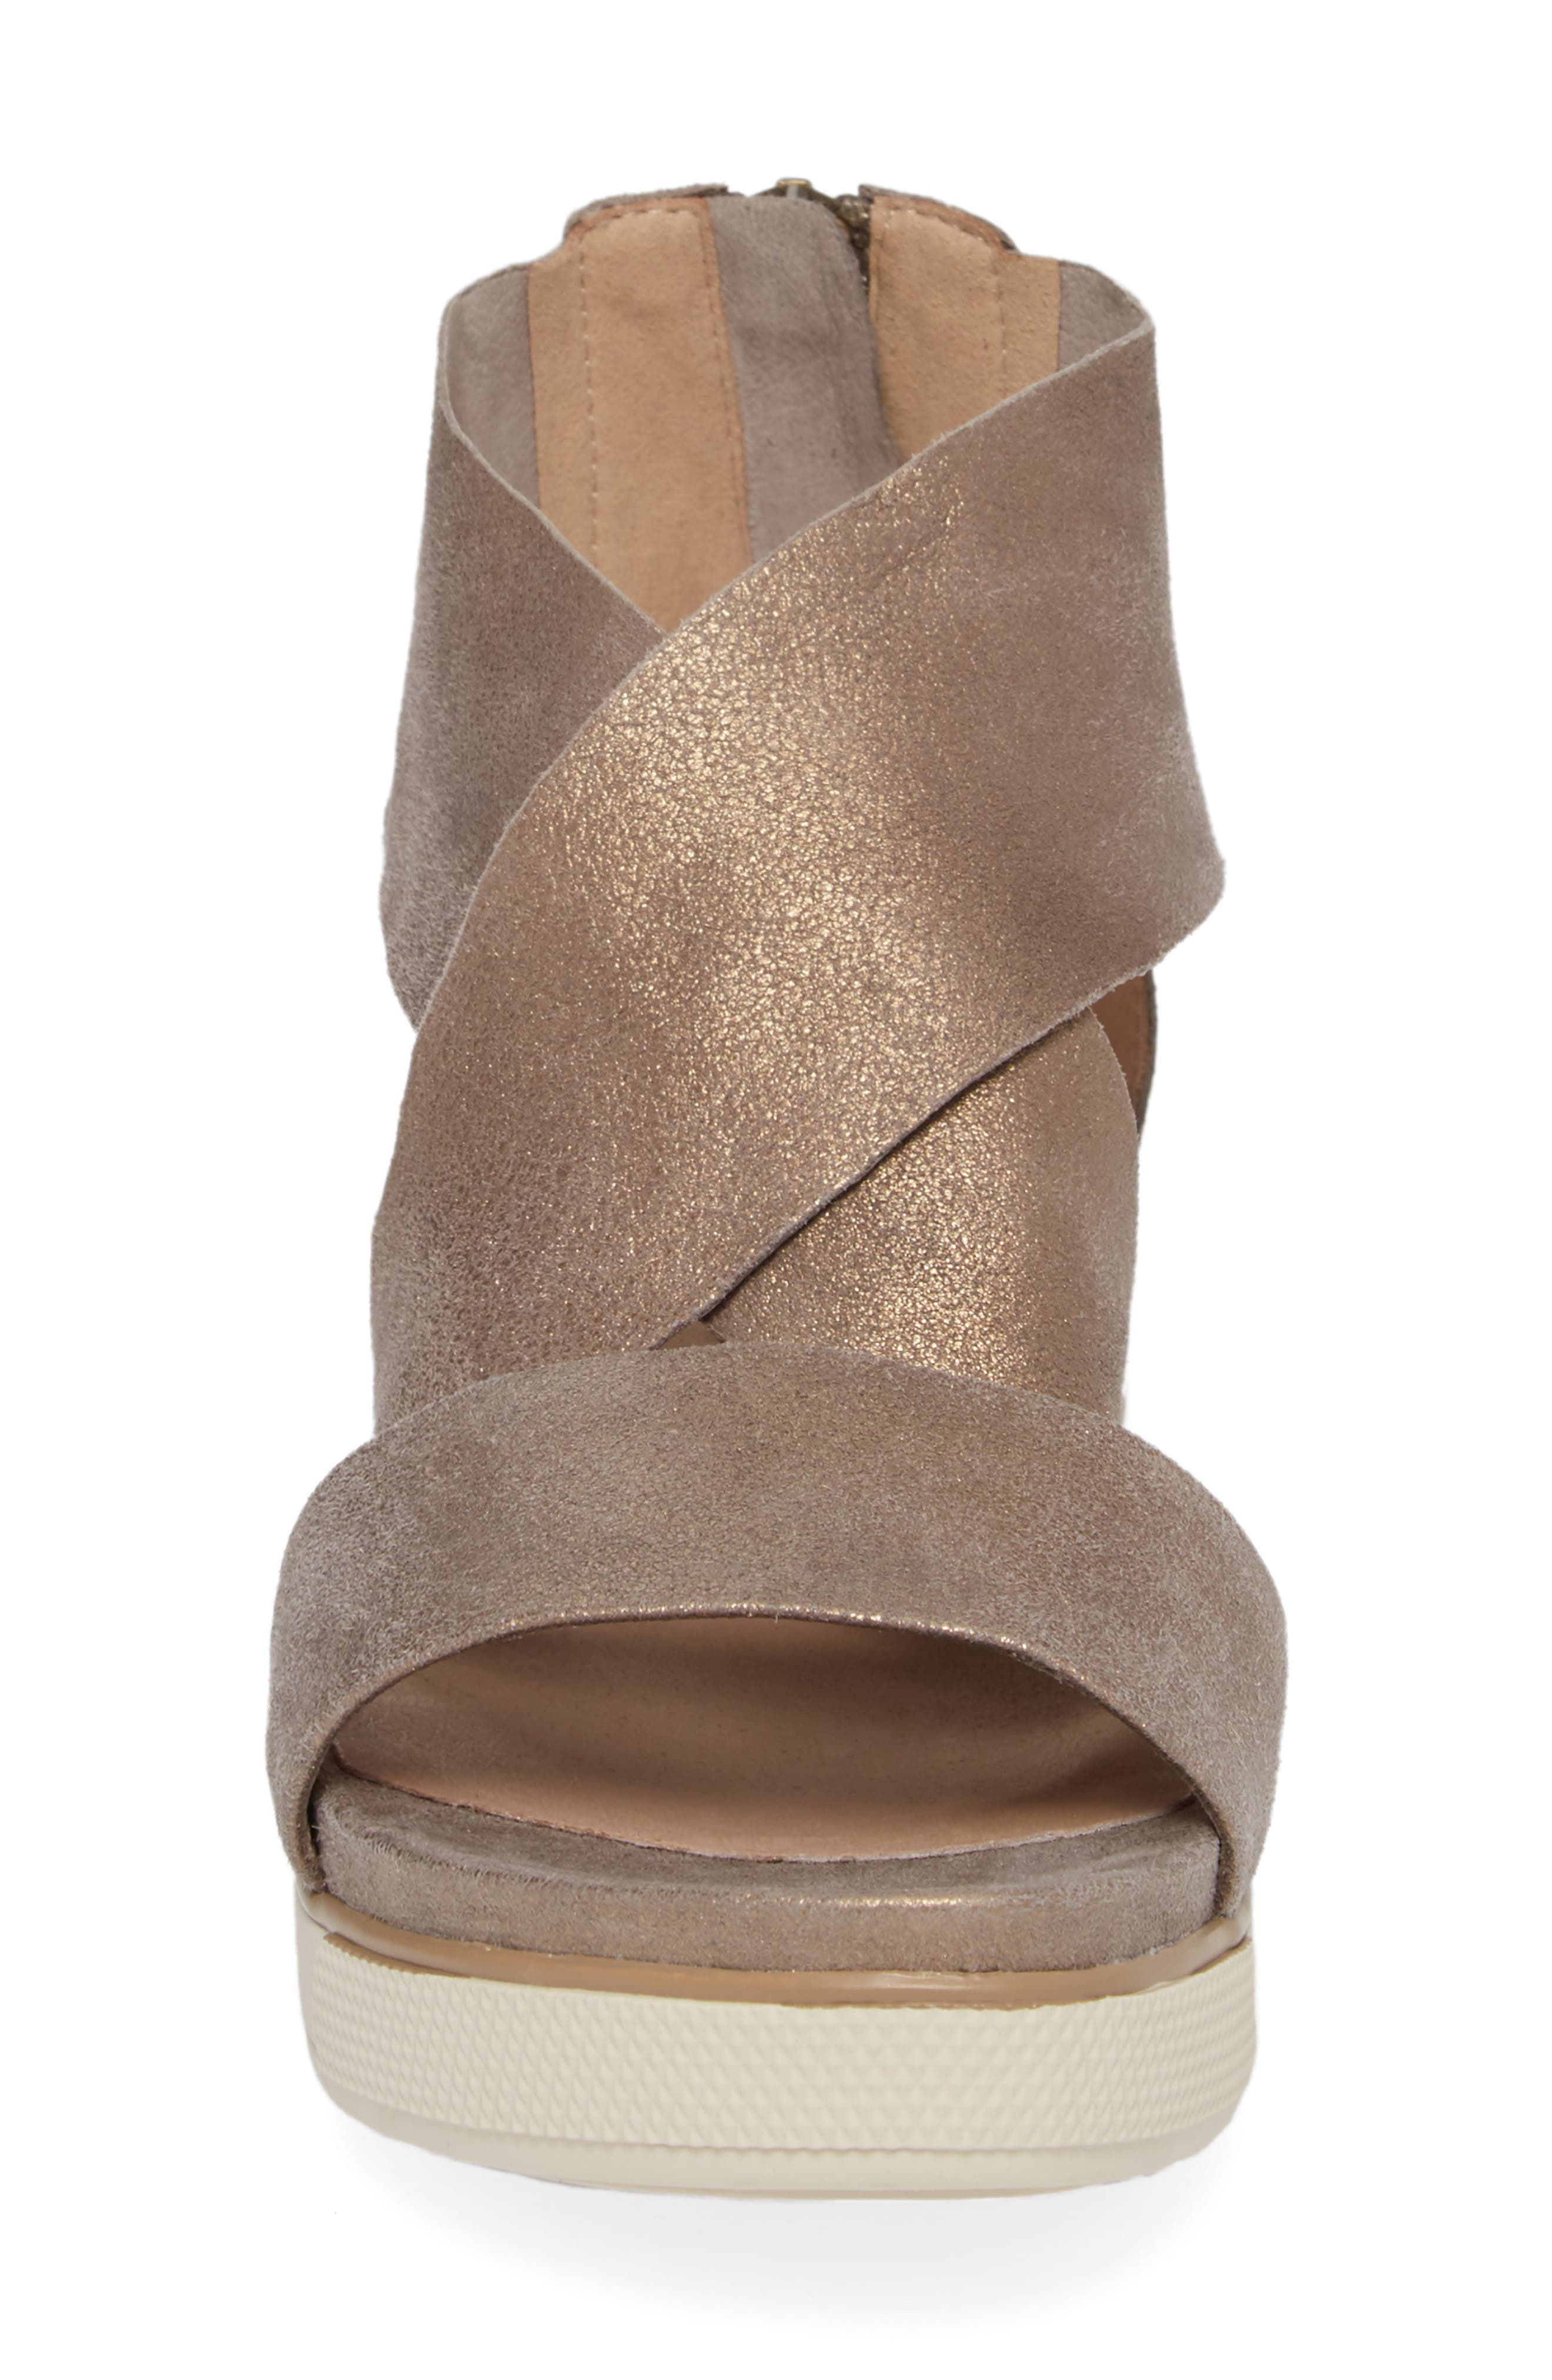 Sport Platform Sandal,                             Alternate thumbnail 4, color,                             PLATINUM LEATHER